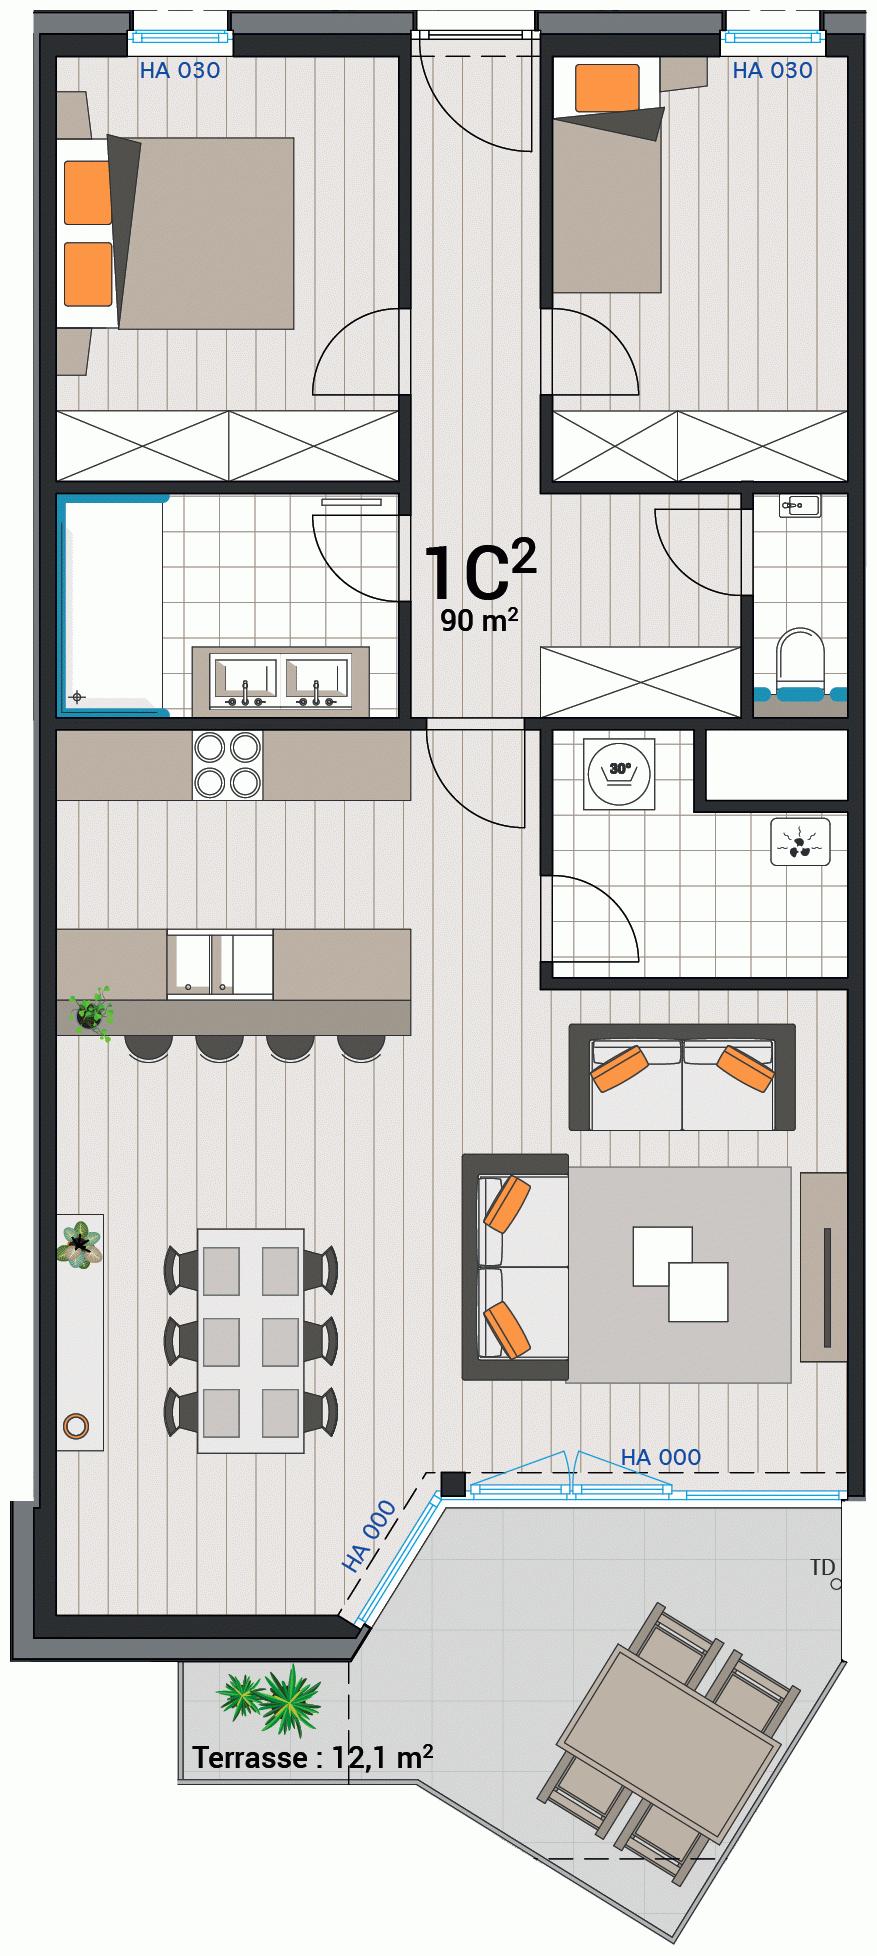 Appartement 1C